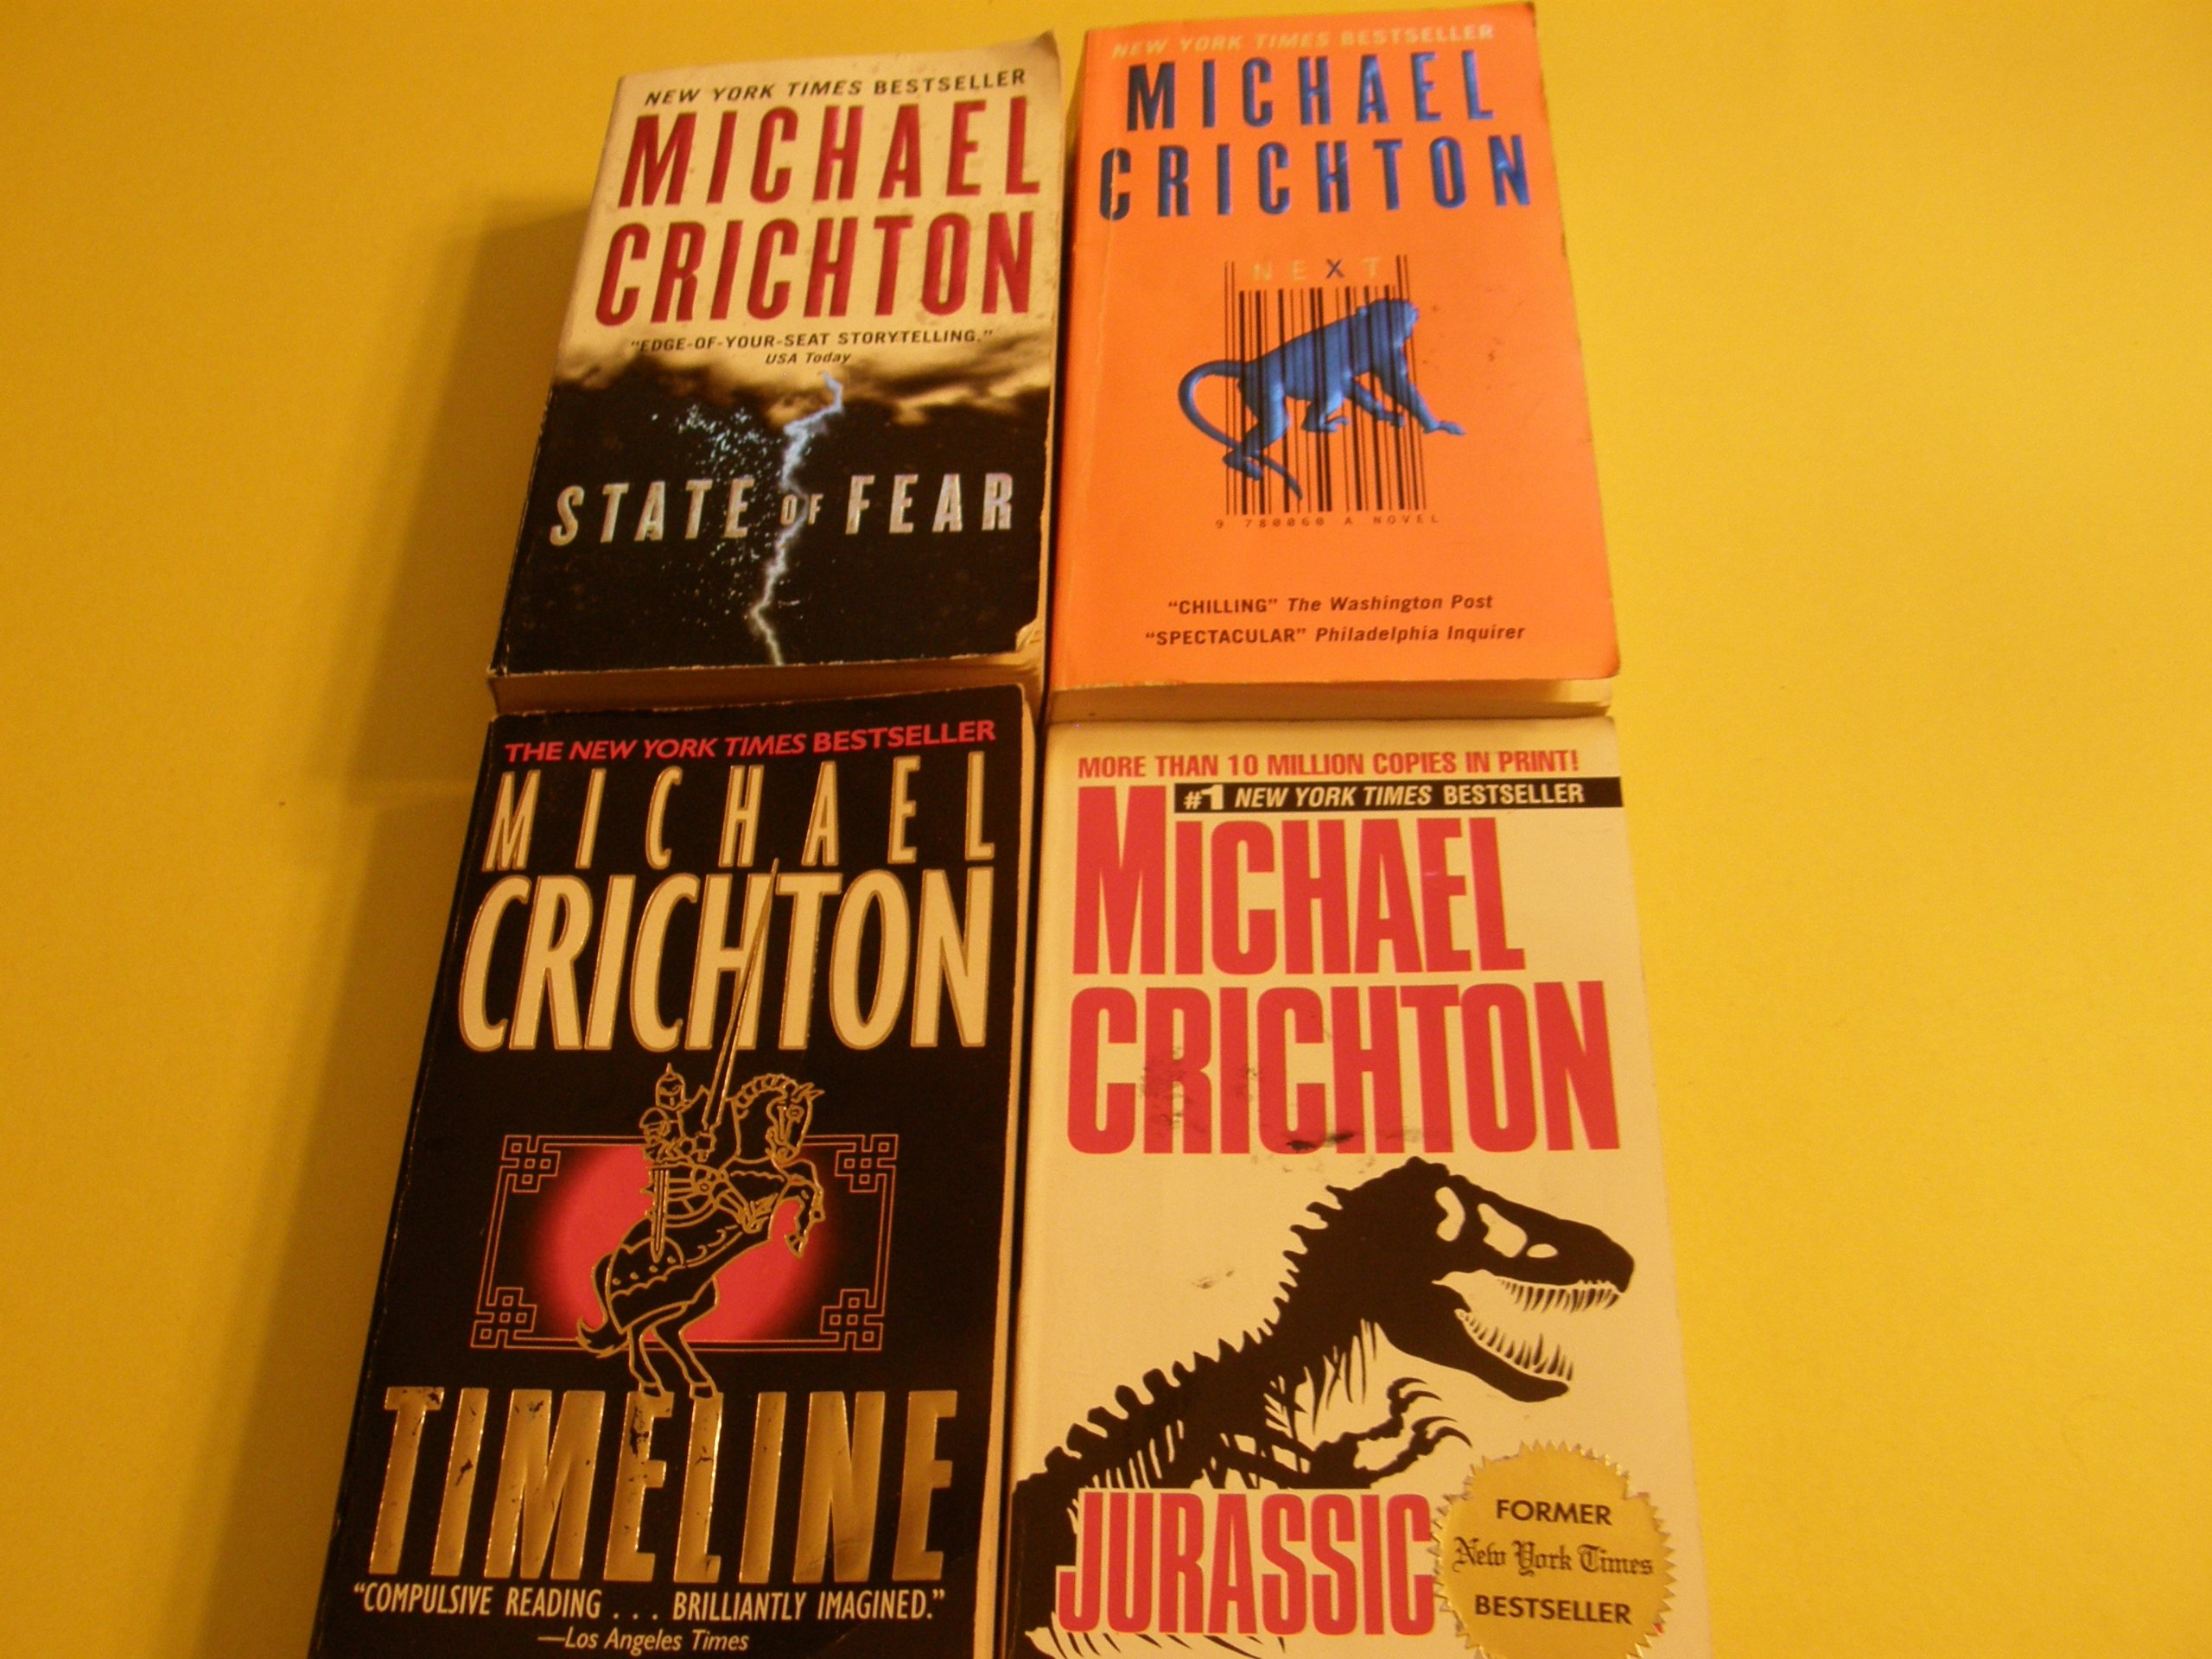 Michael Crichton climate